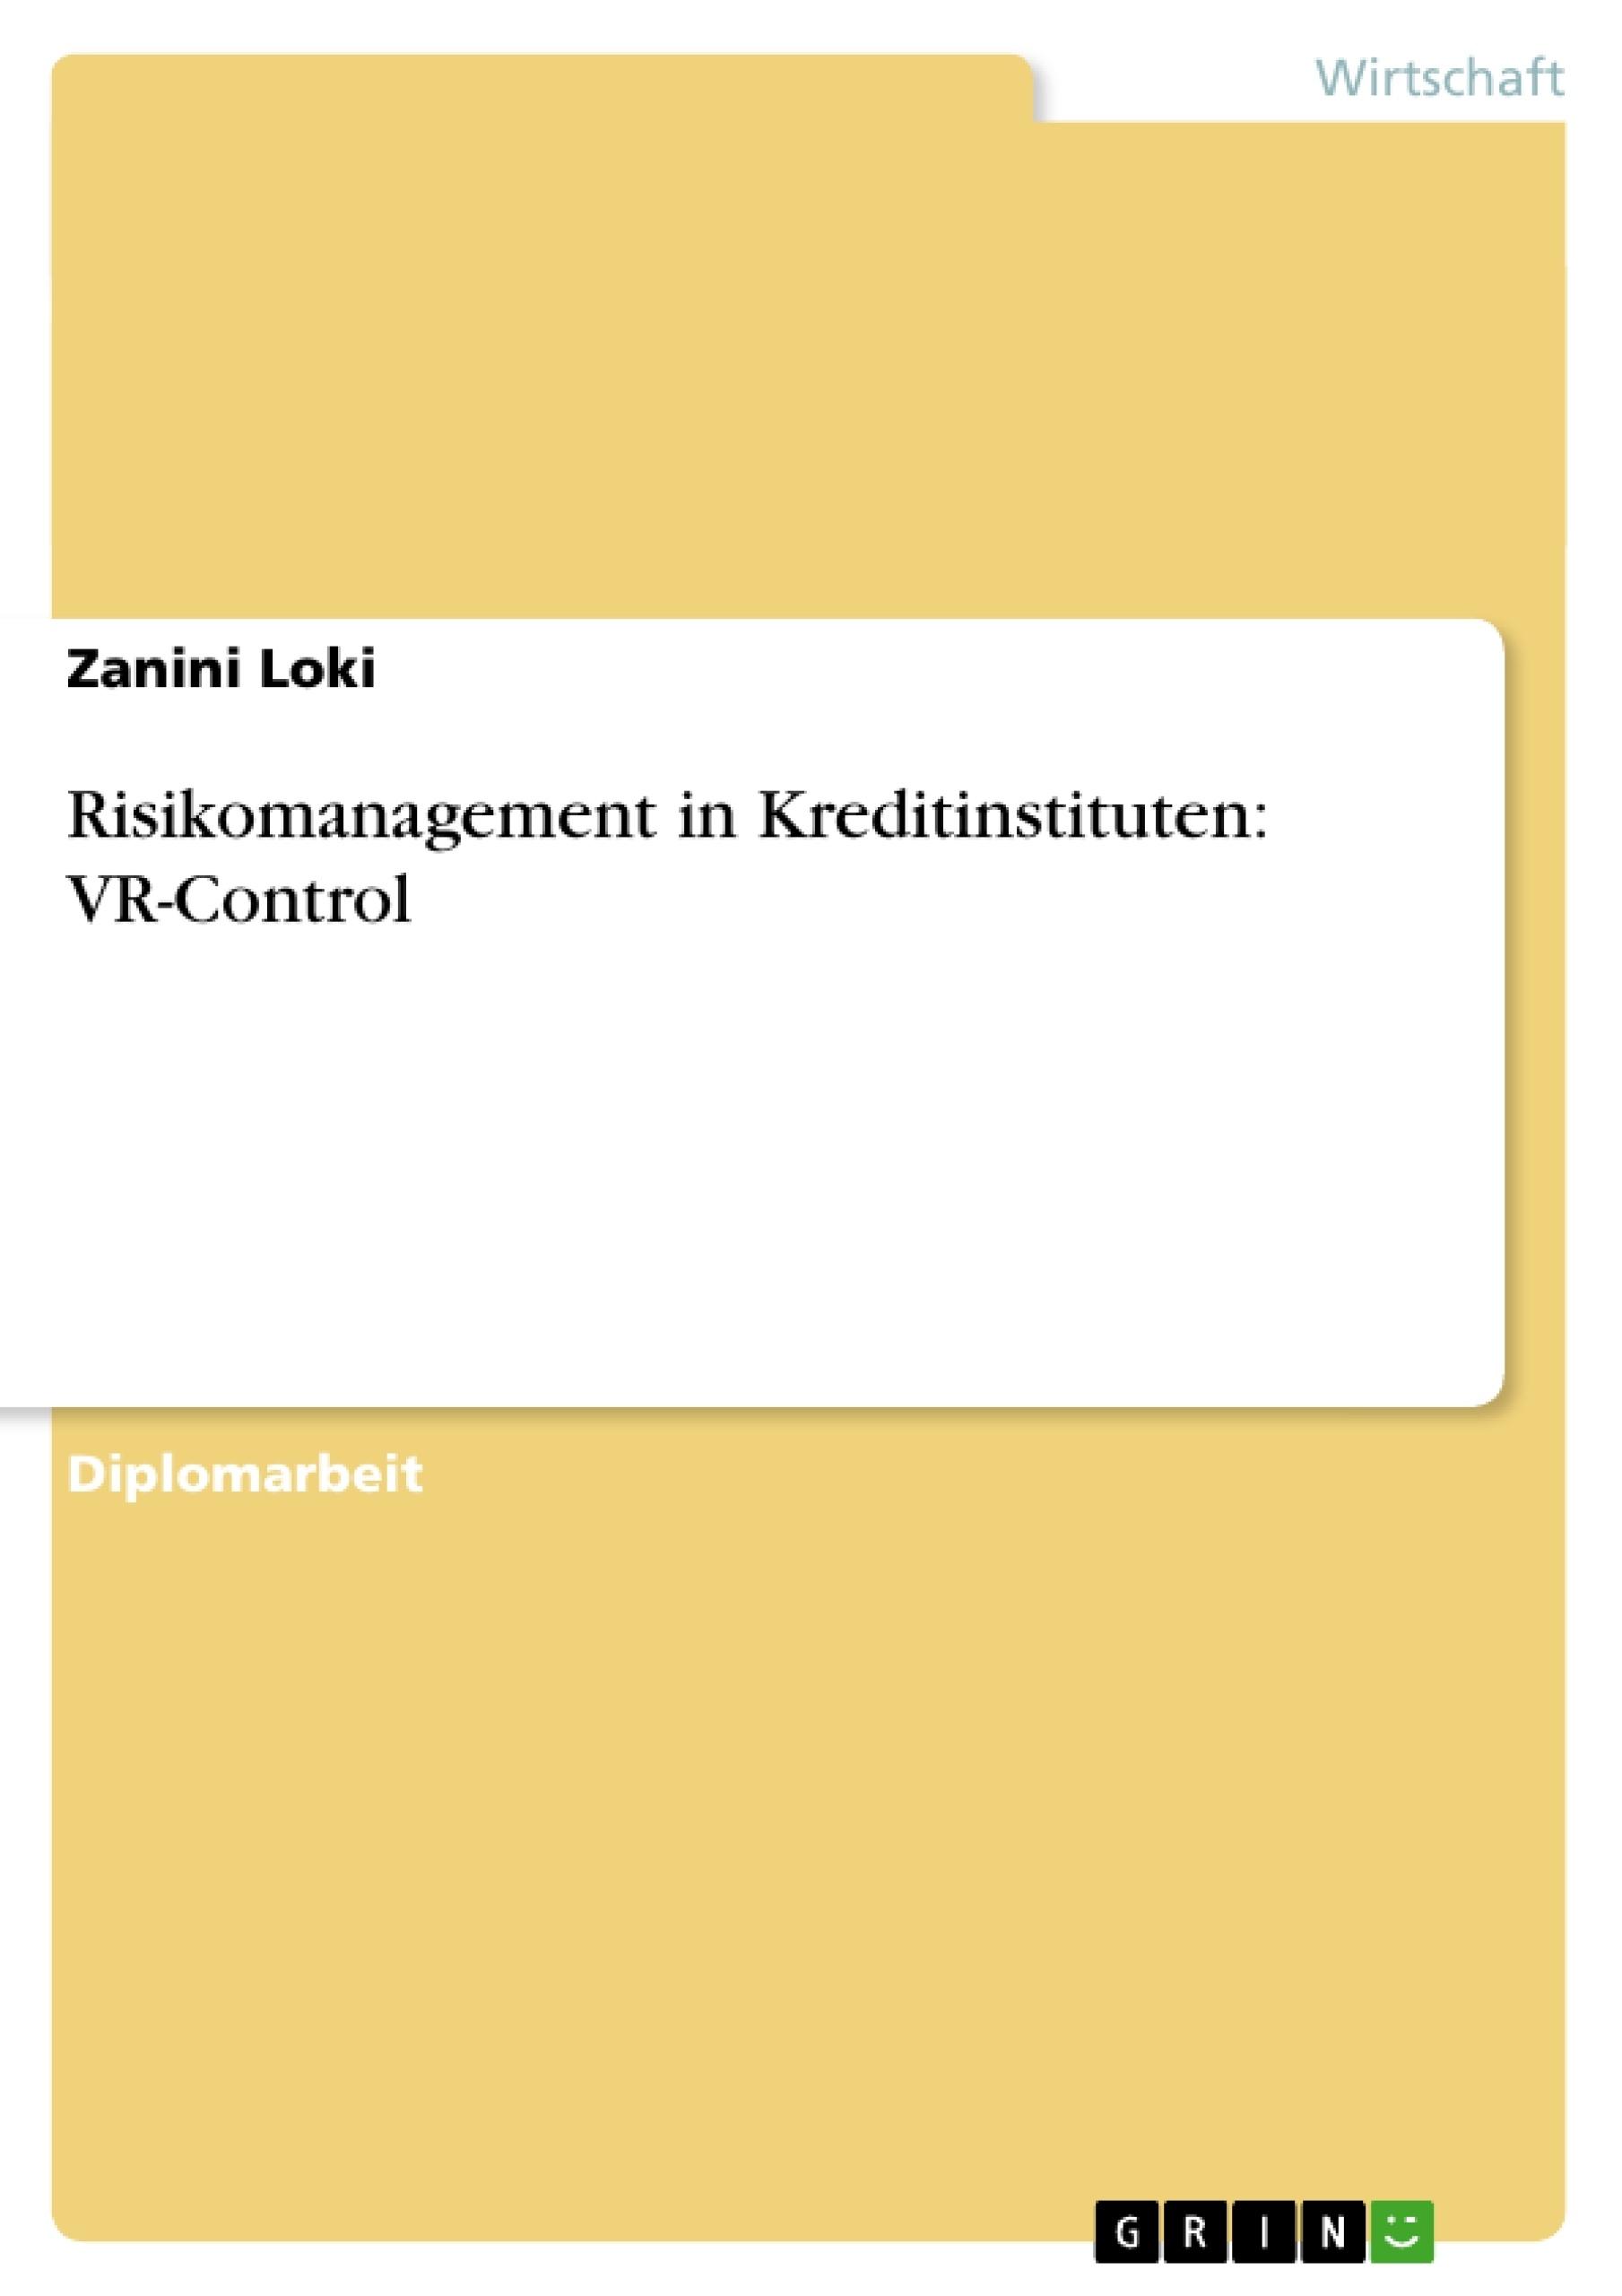 Titel: Risikomanagement in Kreditinstituten: VR-Control